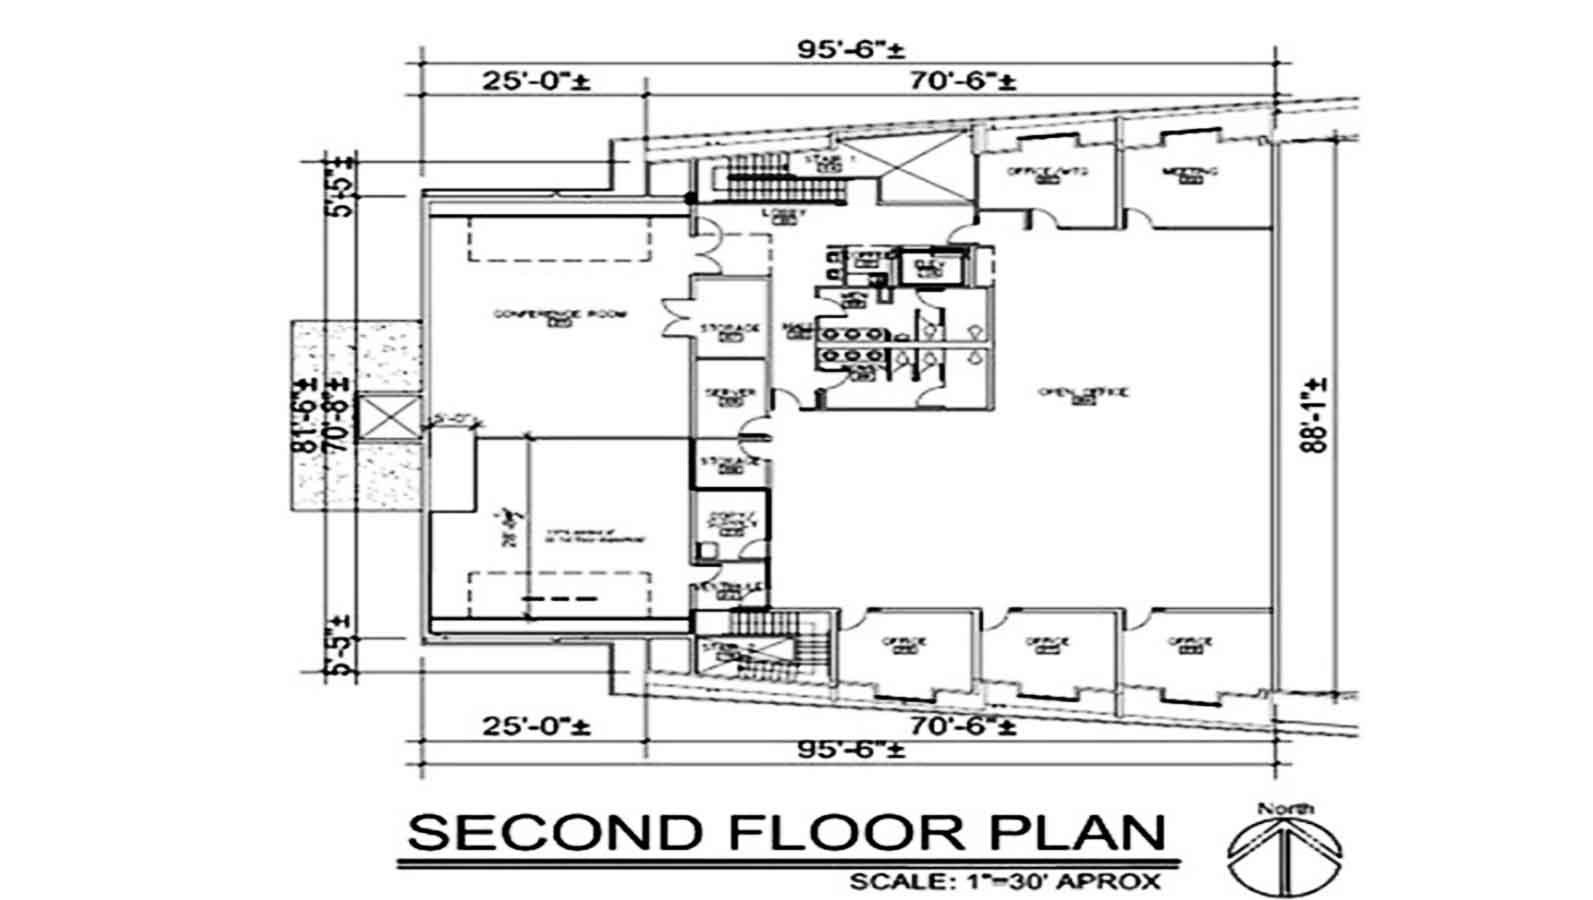 3741_Floorplan2.jpg